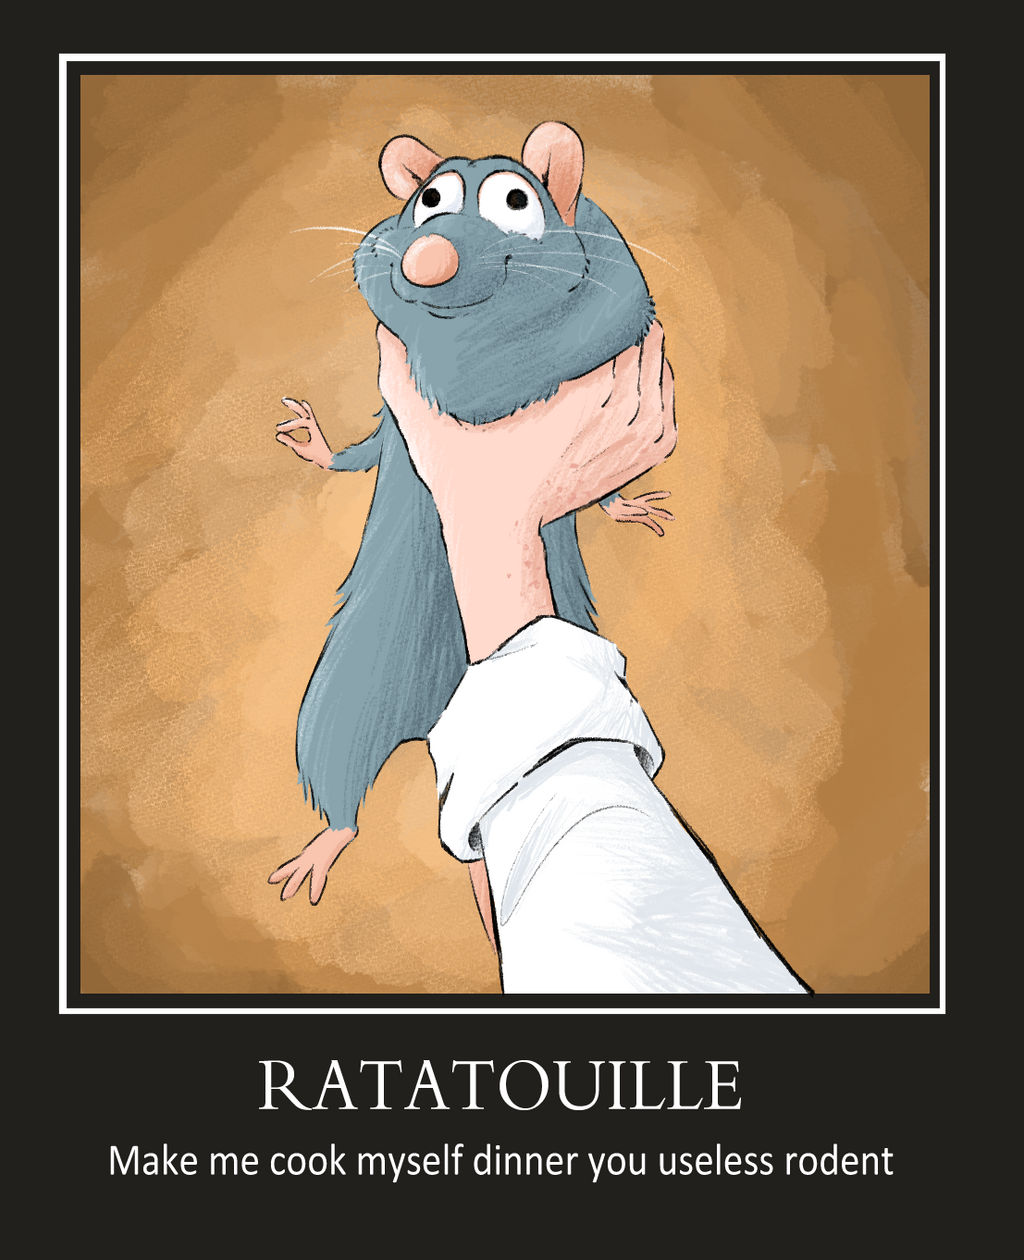 Ratatouille Meme By Kira Mint Tsuneo On Deviantart